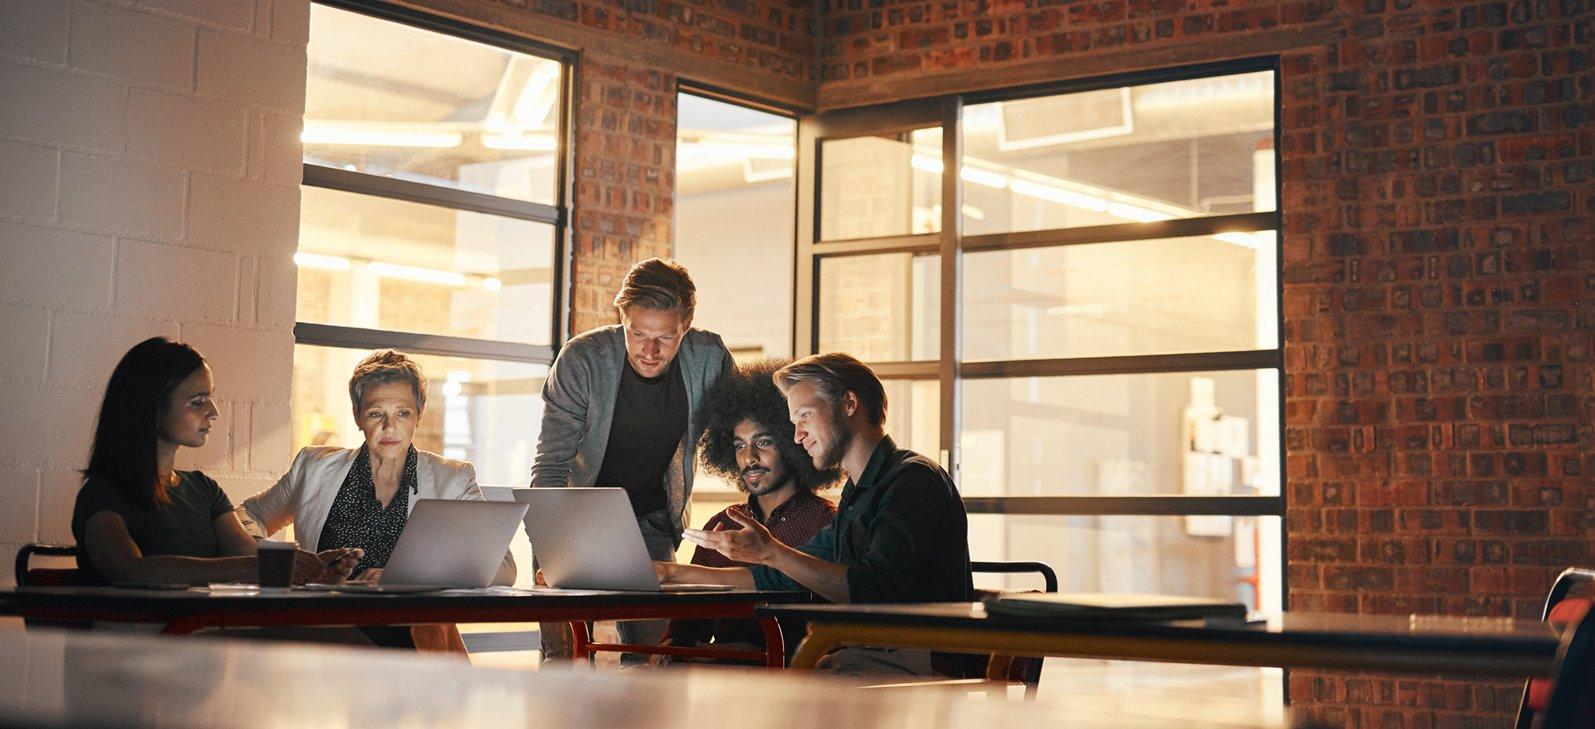 Blog: Make Your Digital Workplace a Transformation Incubator